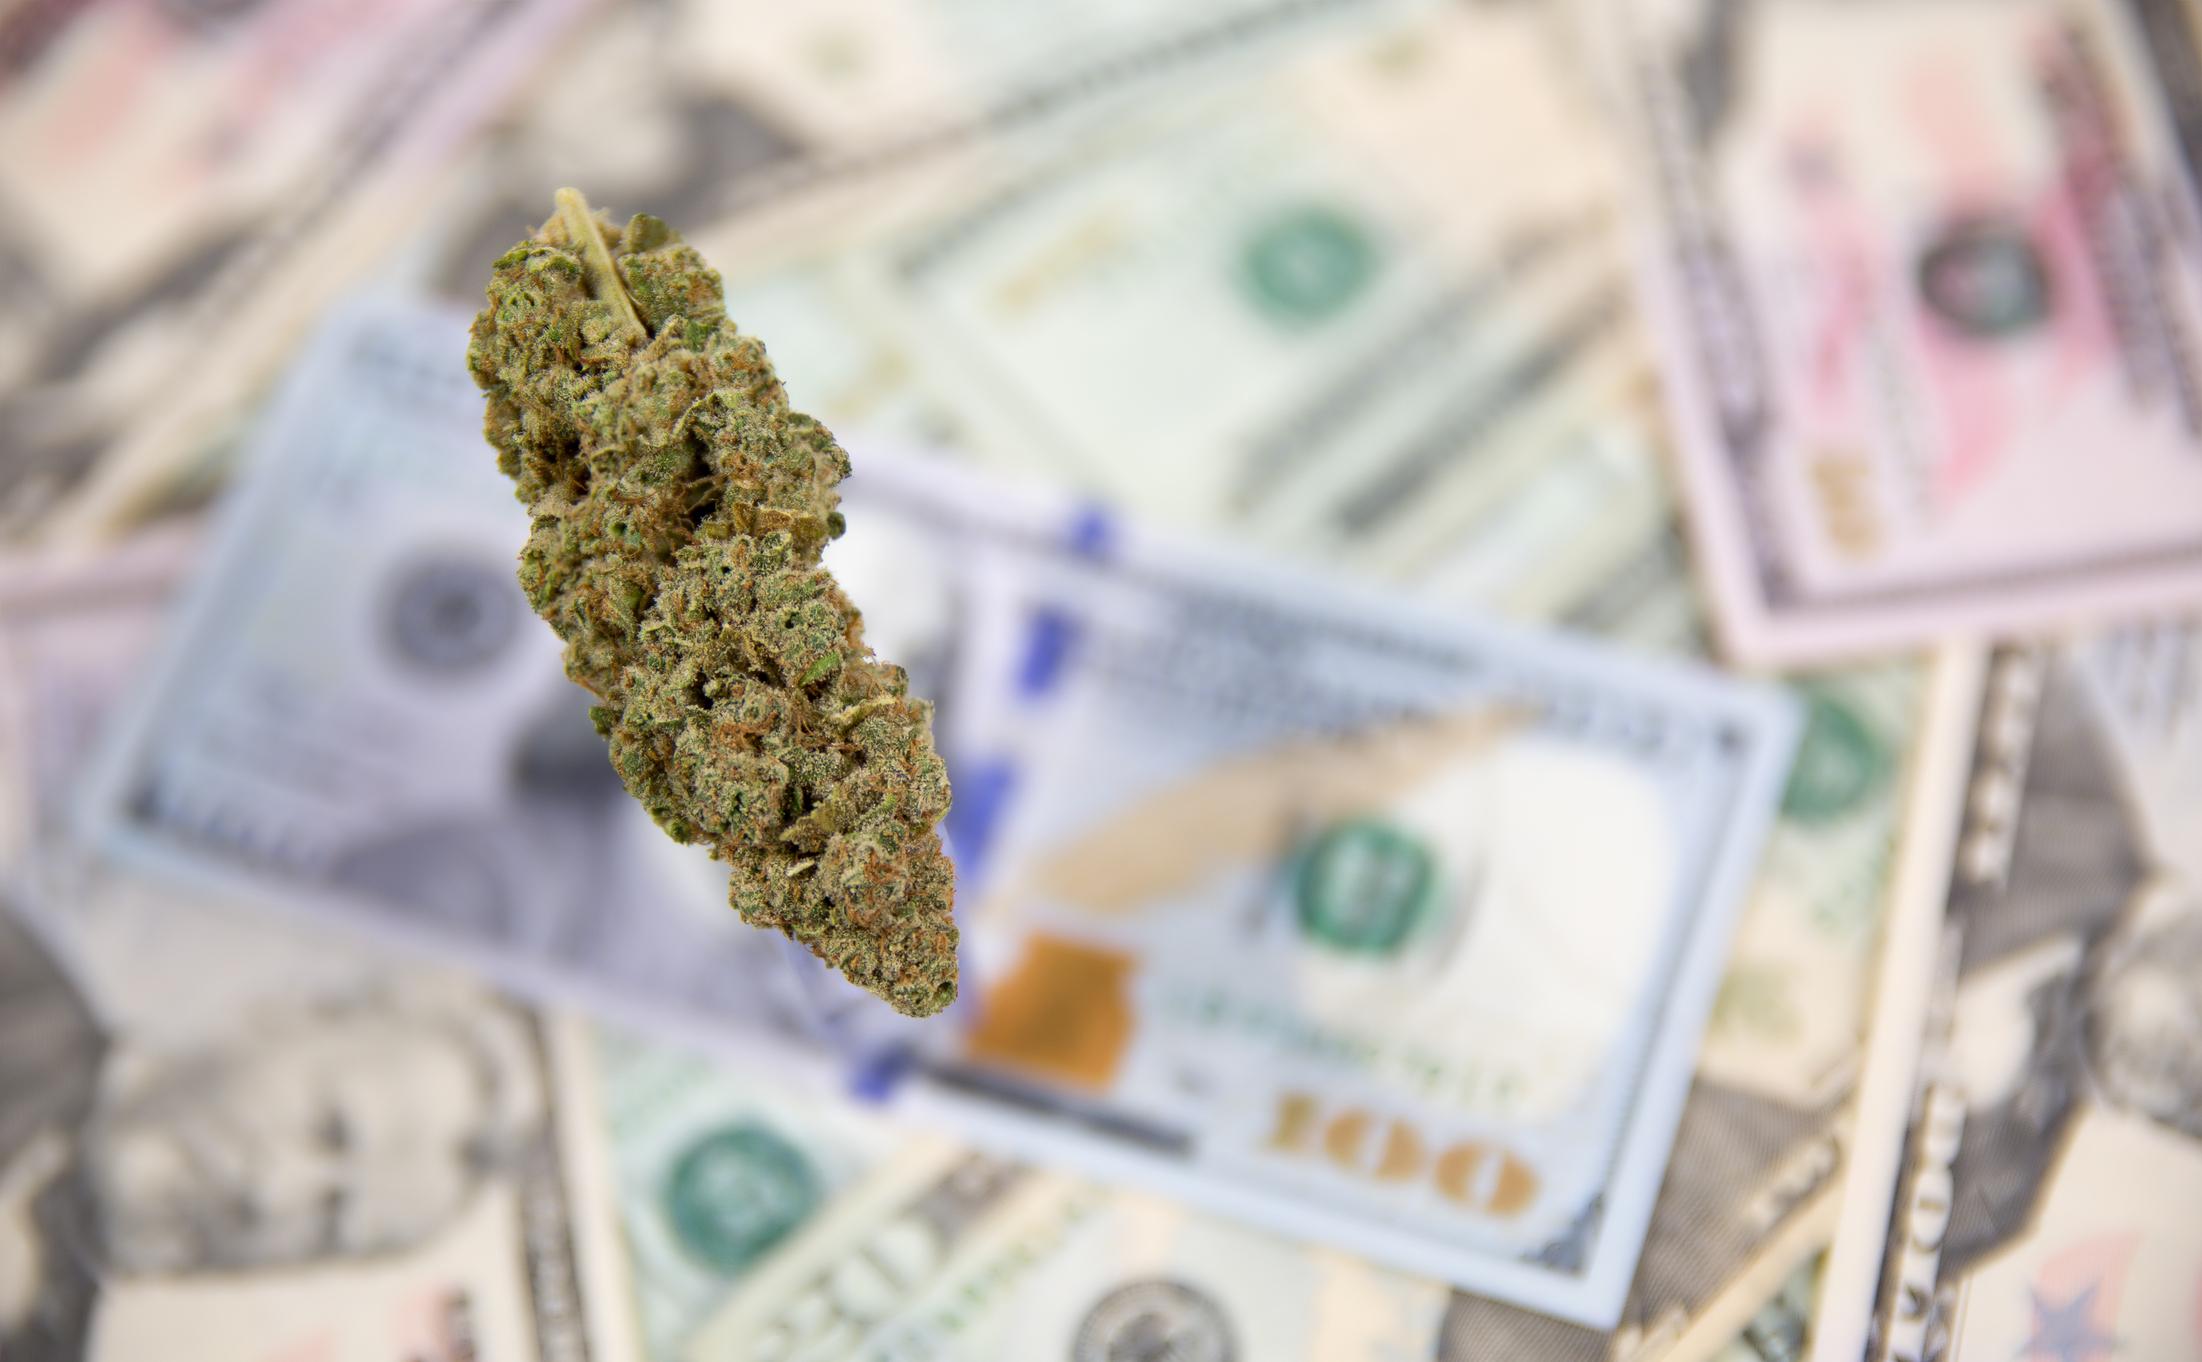 Marijuana bud against a blurred background of money